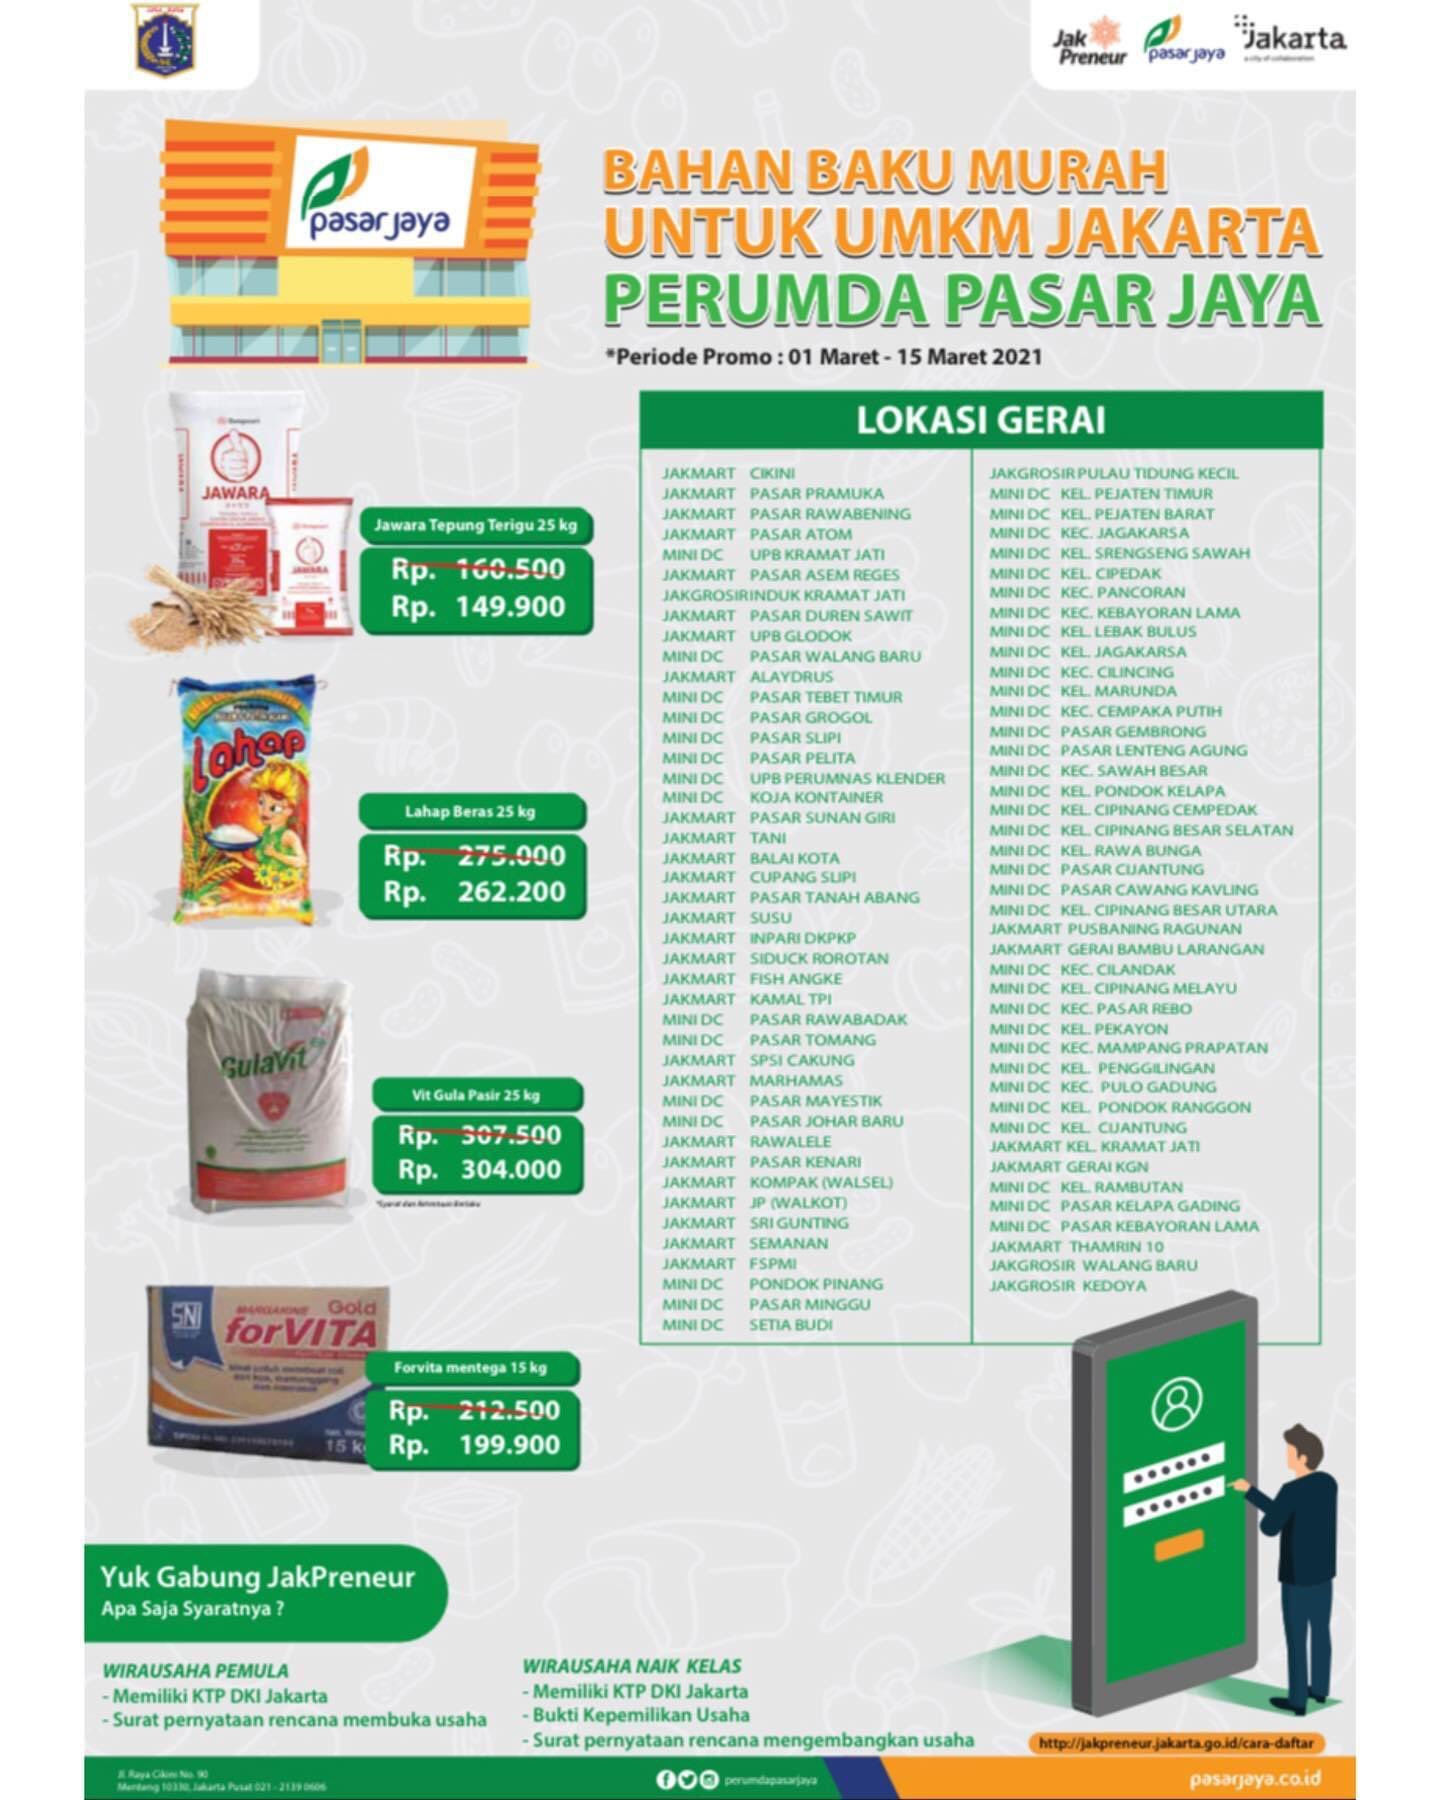 Jakpreneur Jakarta Go Id/cara-daftar : jakpreneur, jakarta, id/cara-daftar, Anies, Baswedan, Twitter:,